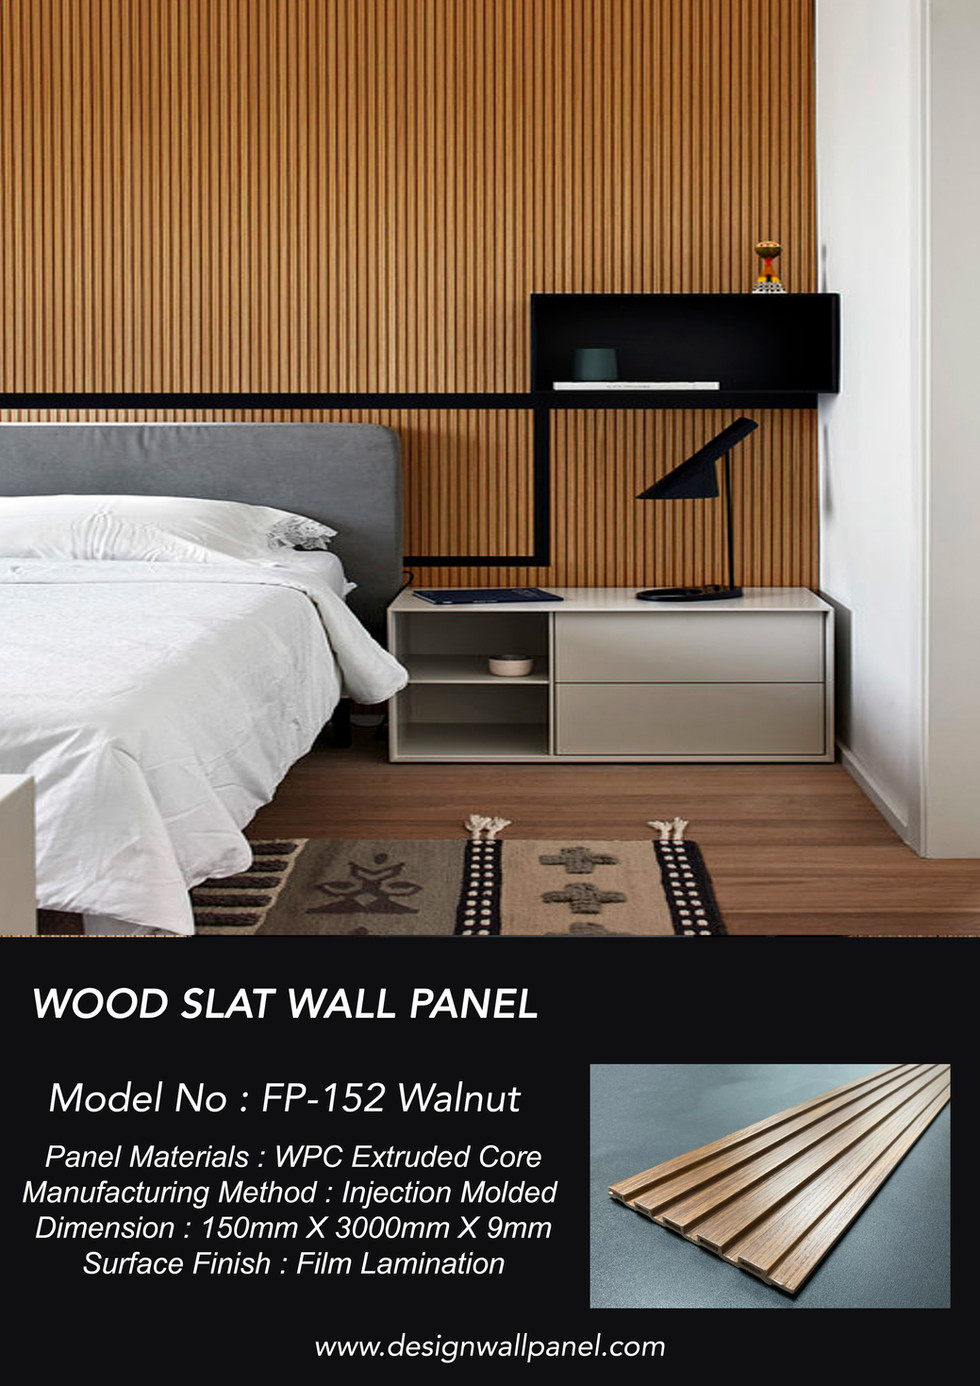 wood slat wall panel FP-152 walnut .jpg